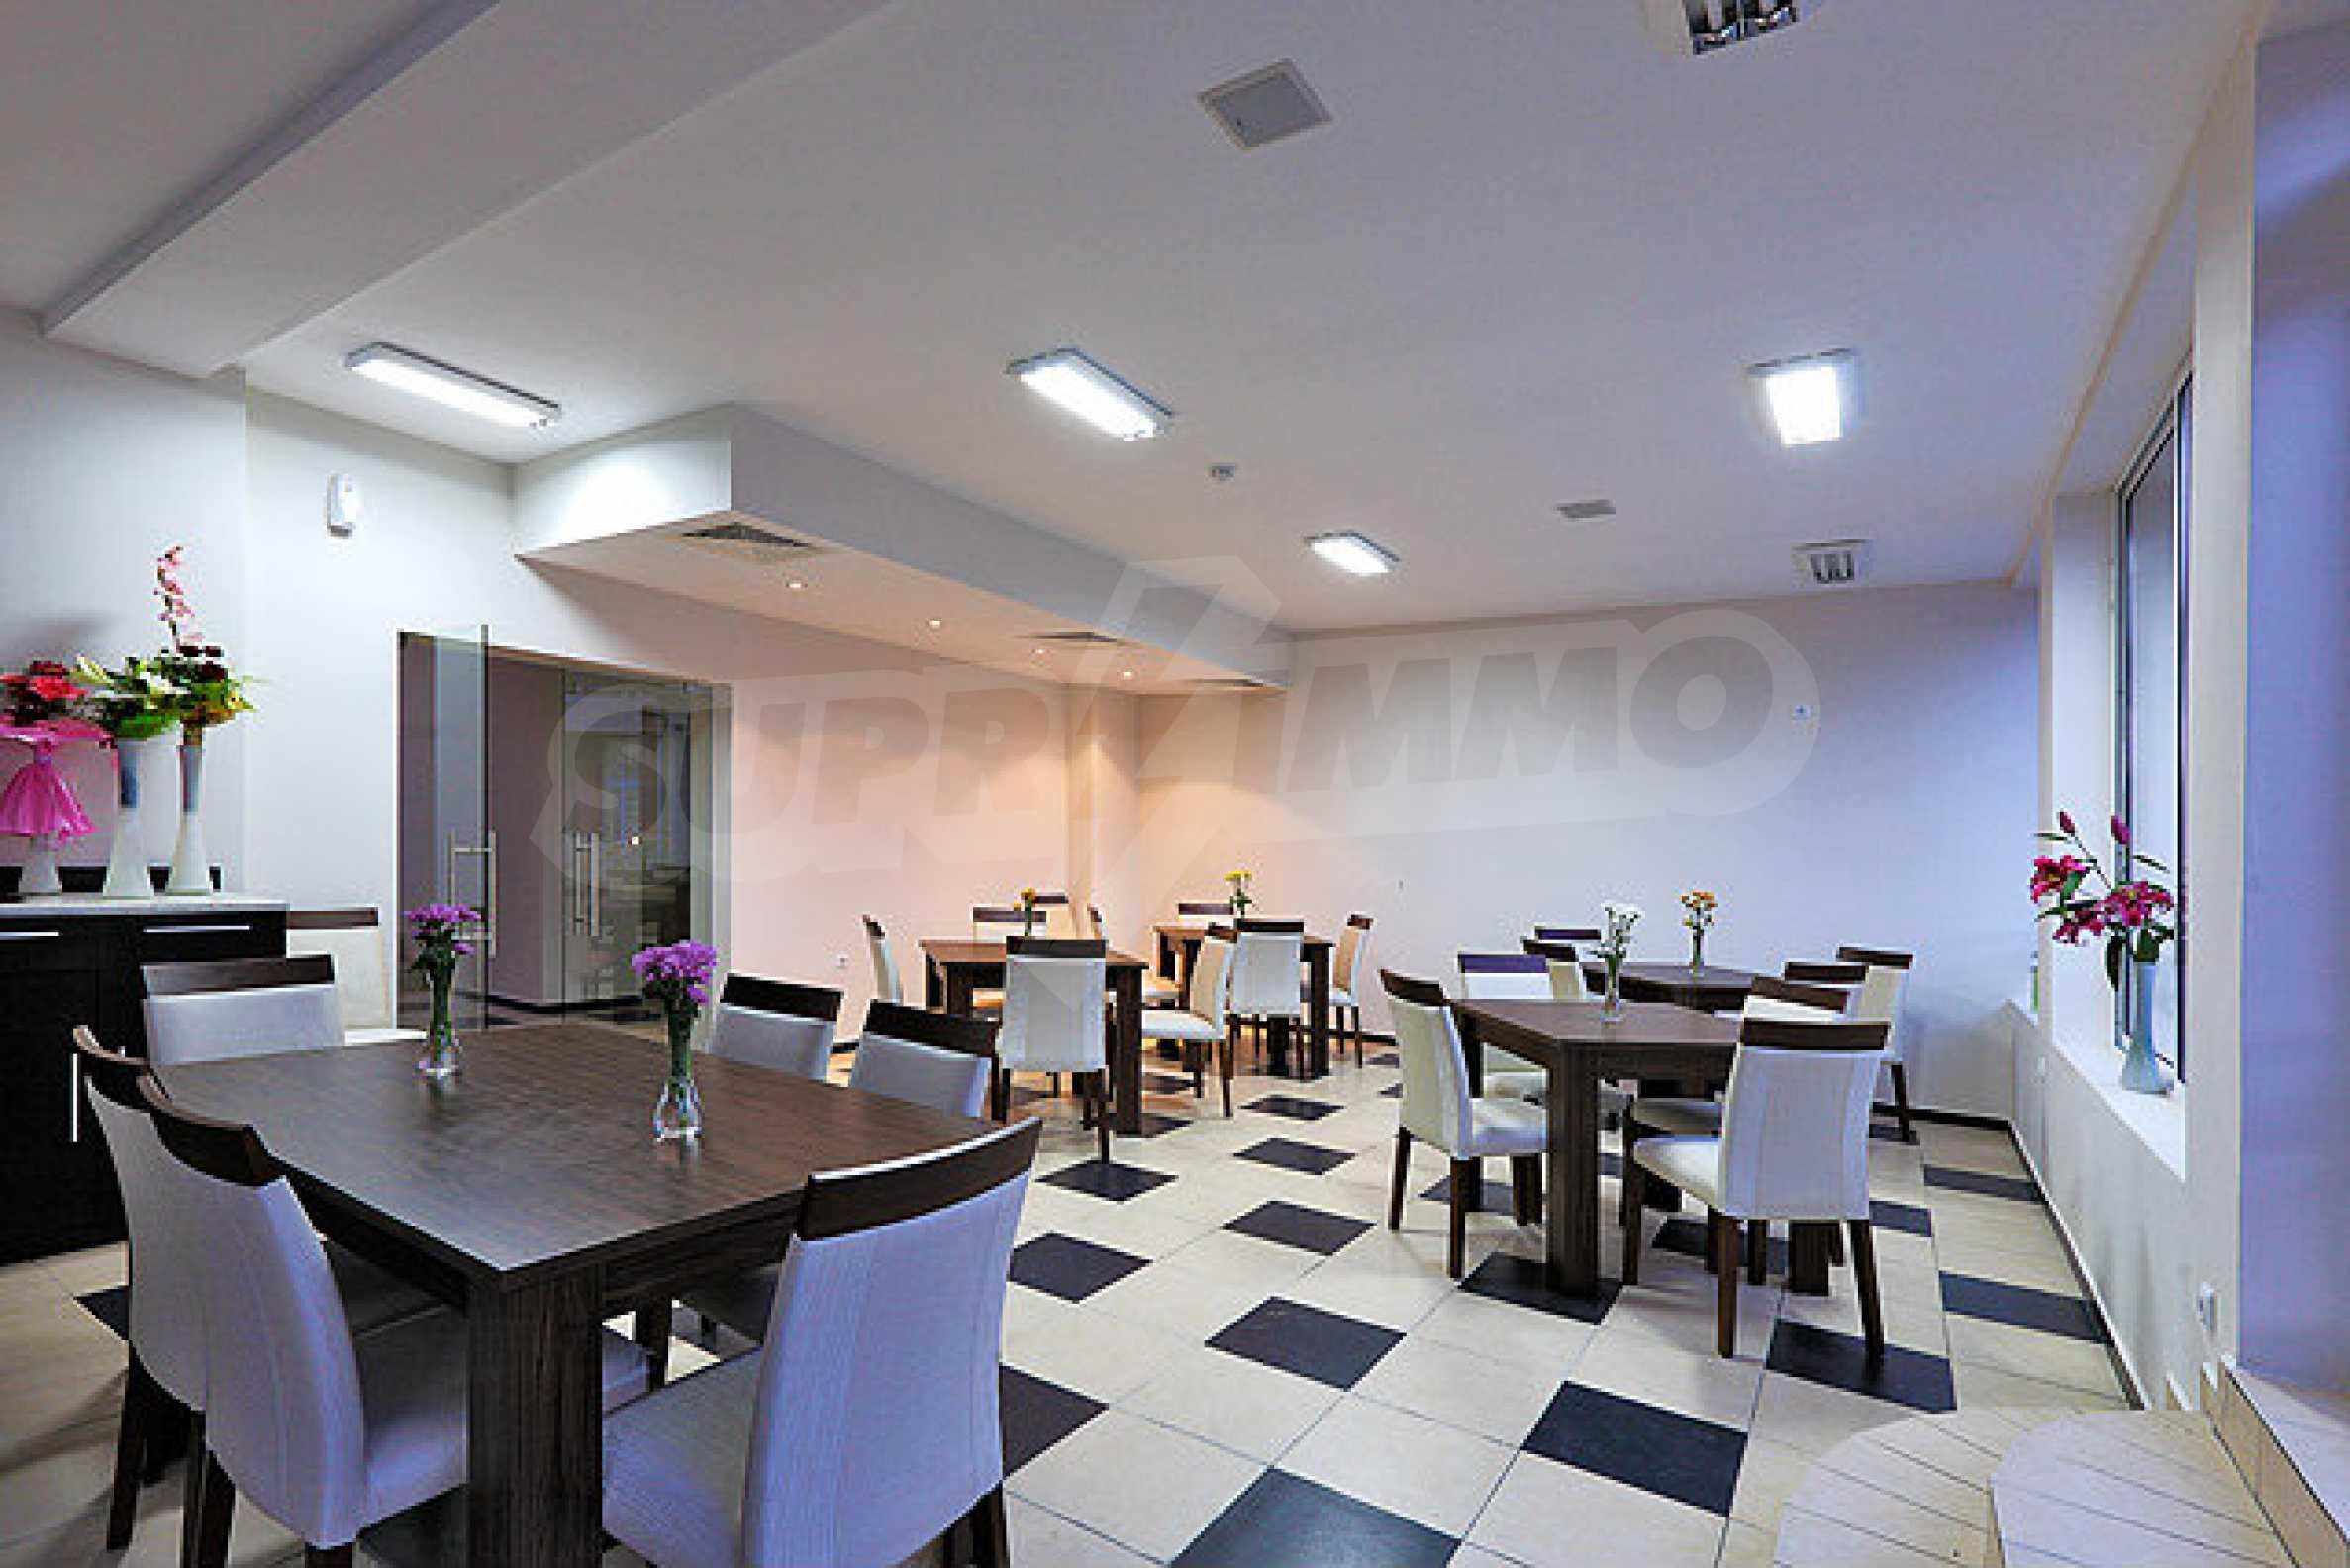 Трехкомнатный апартамент на продажу в комплексе Emberli в курорте Лозенец 13